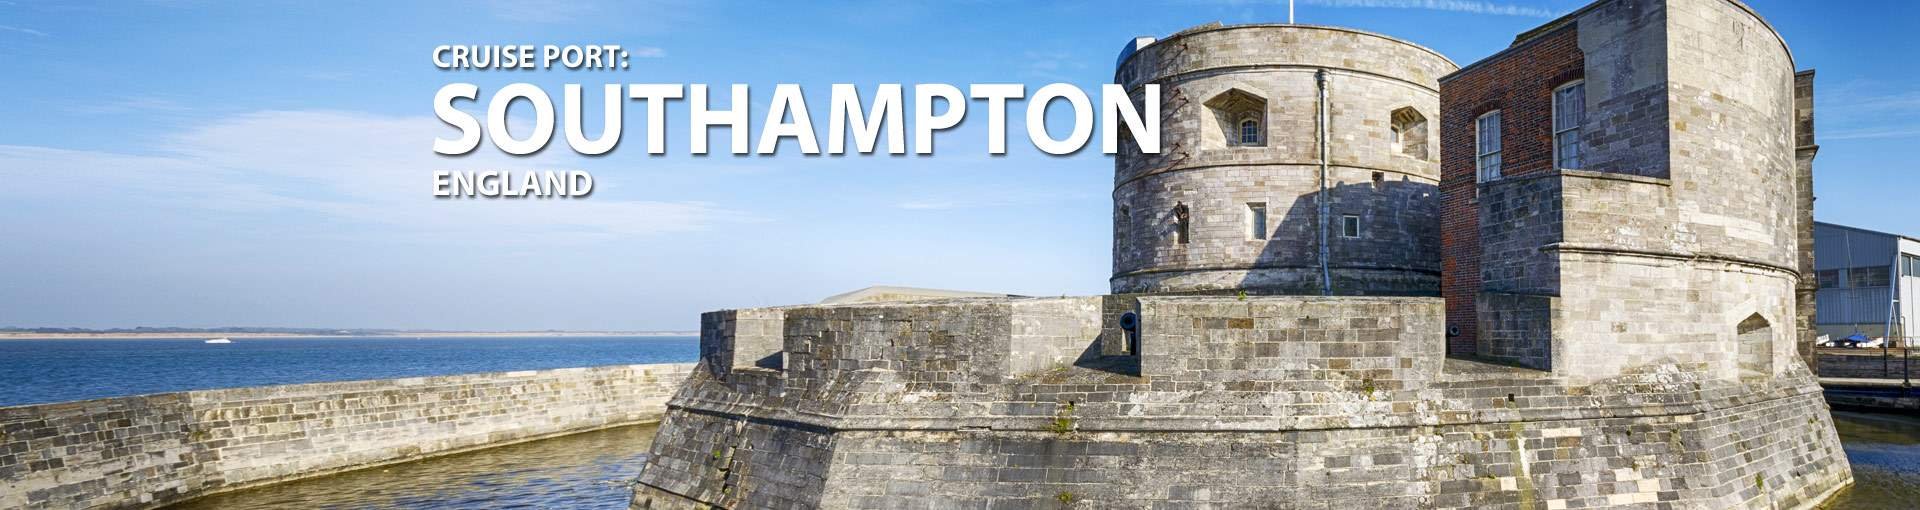 Cruises from Southampton, England